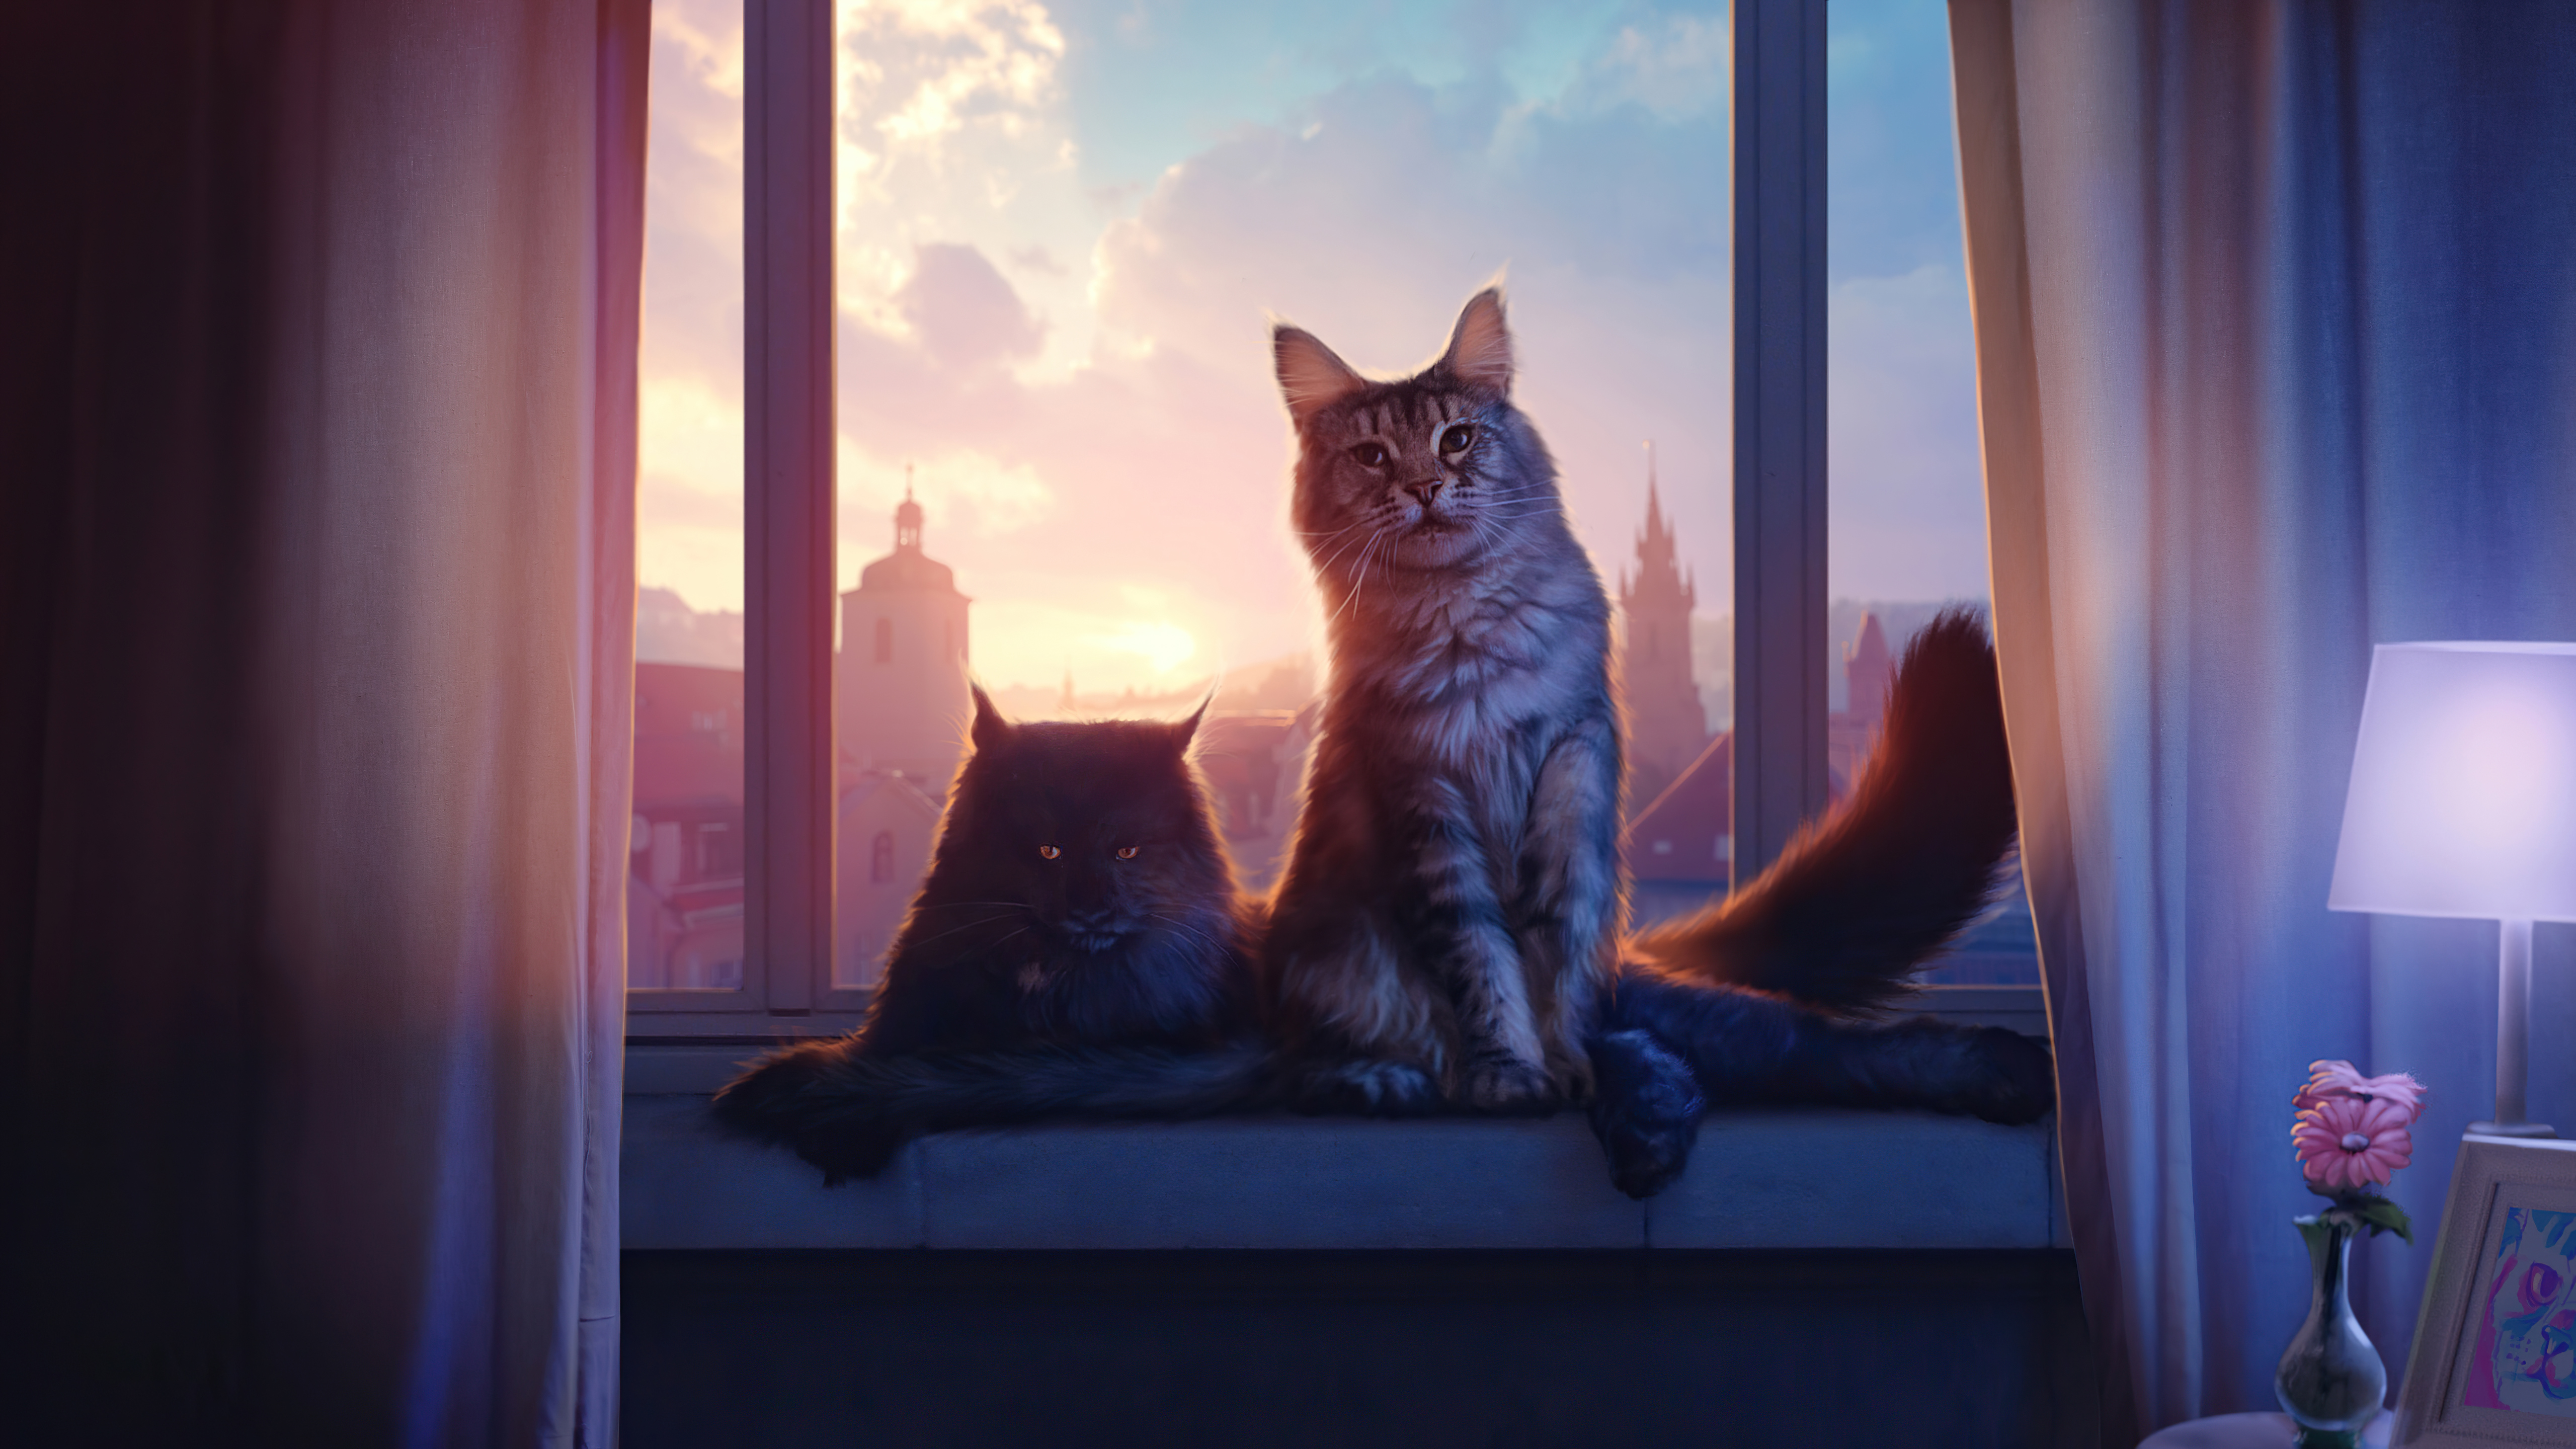 cats 4k 1616872024 - Cats 4k - Cats 4k wallpapers